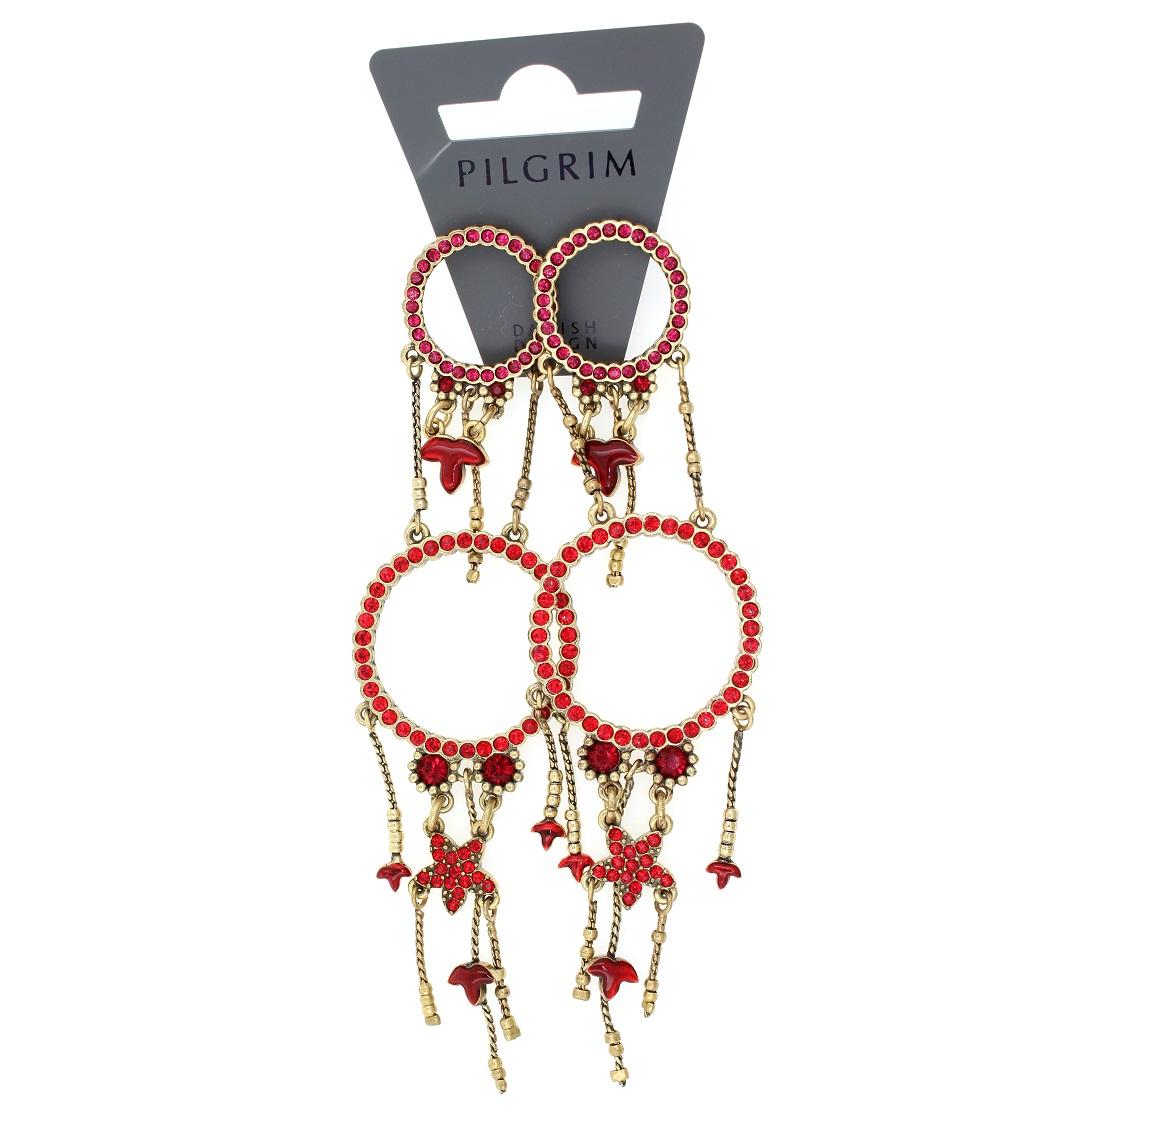 PILGRIM - Circle Line - Double Circle Earrings Oxidised Gold/Red Swarovski BNWT